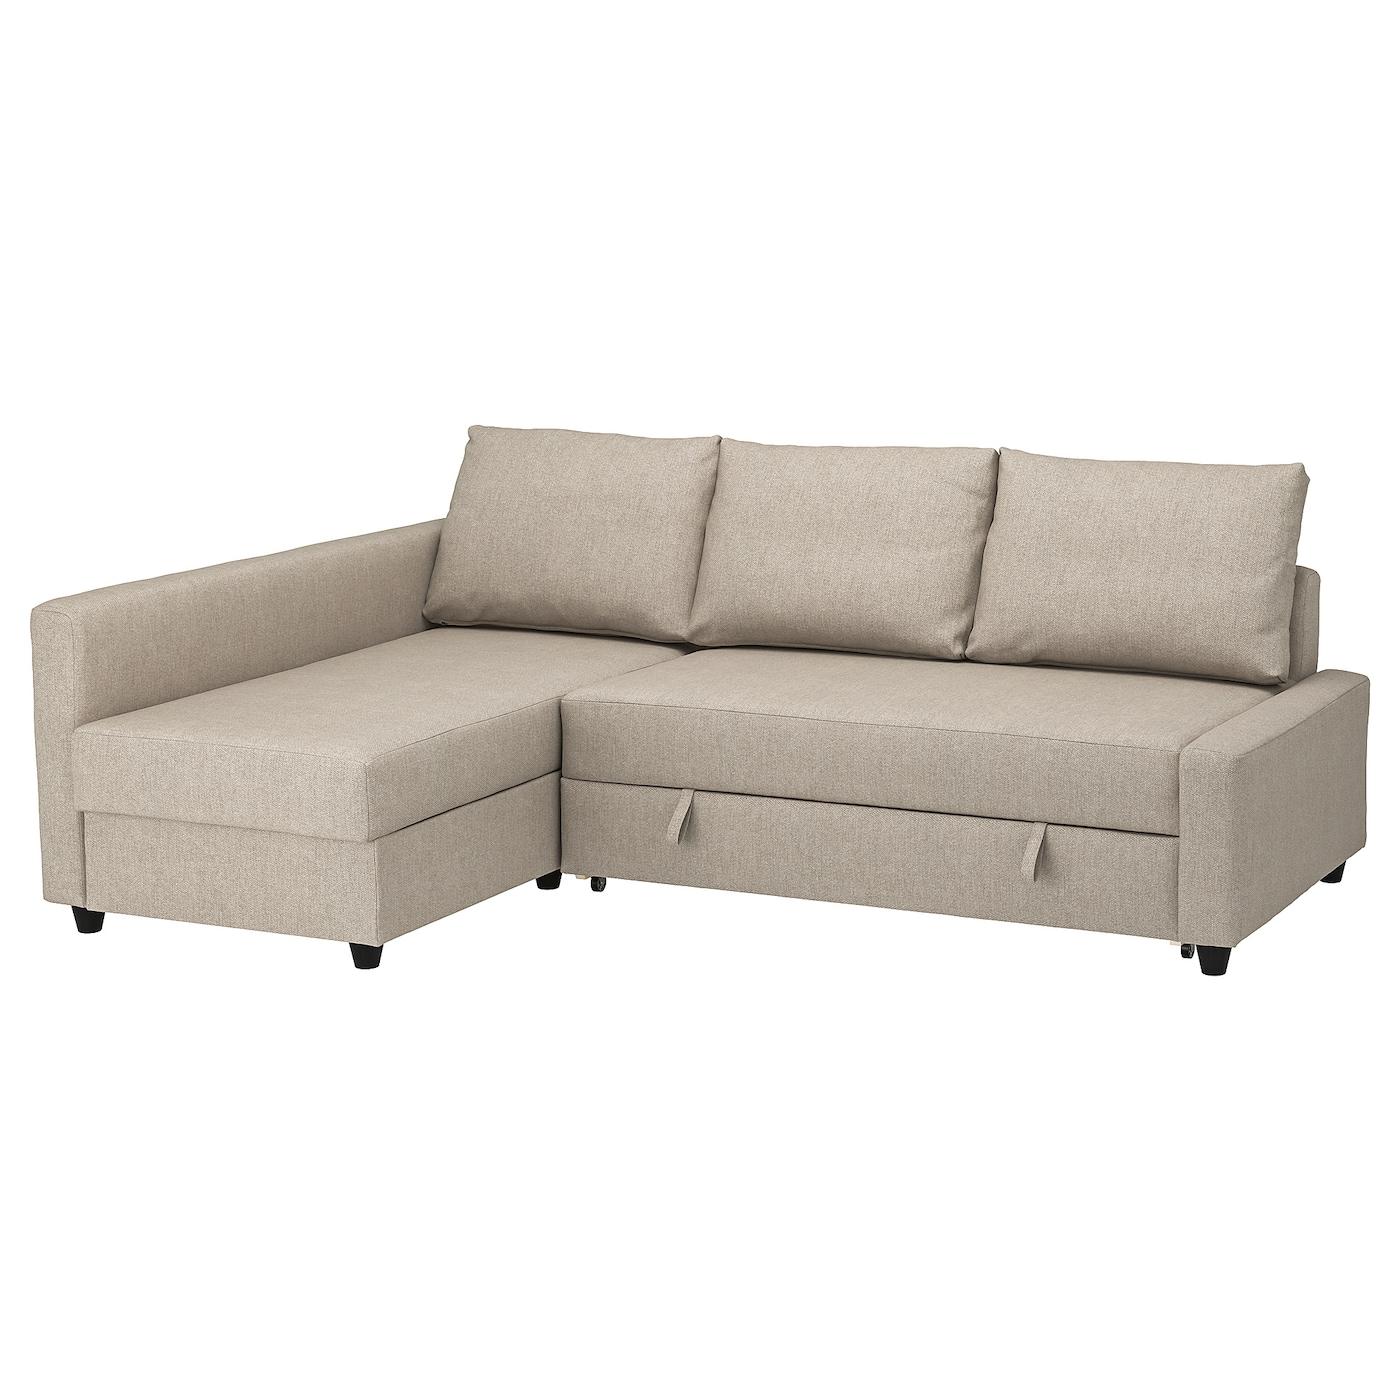 Friheten Canape Conv D Angle Avec Rangement Hyllie Beige Ikea